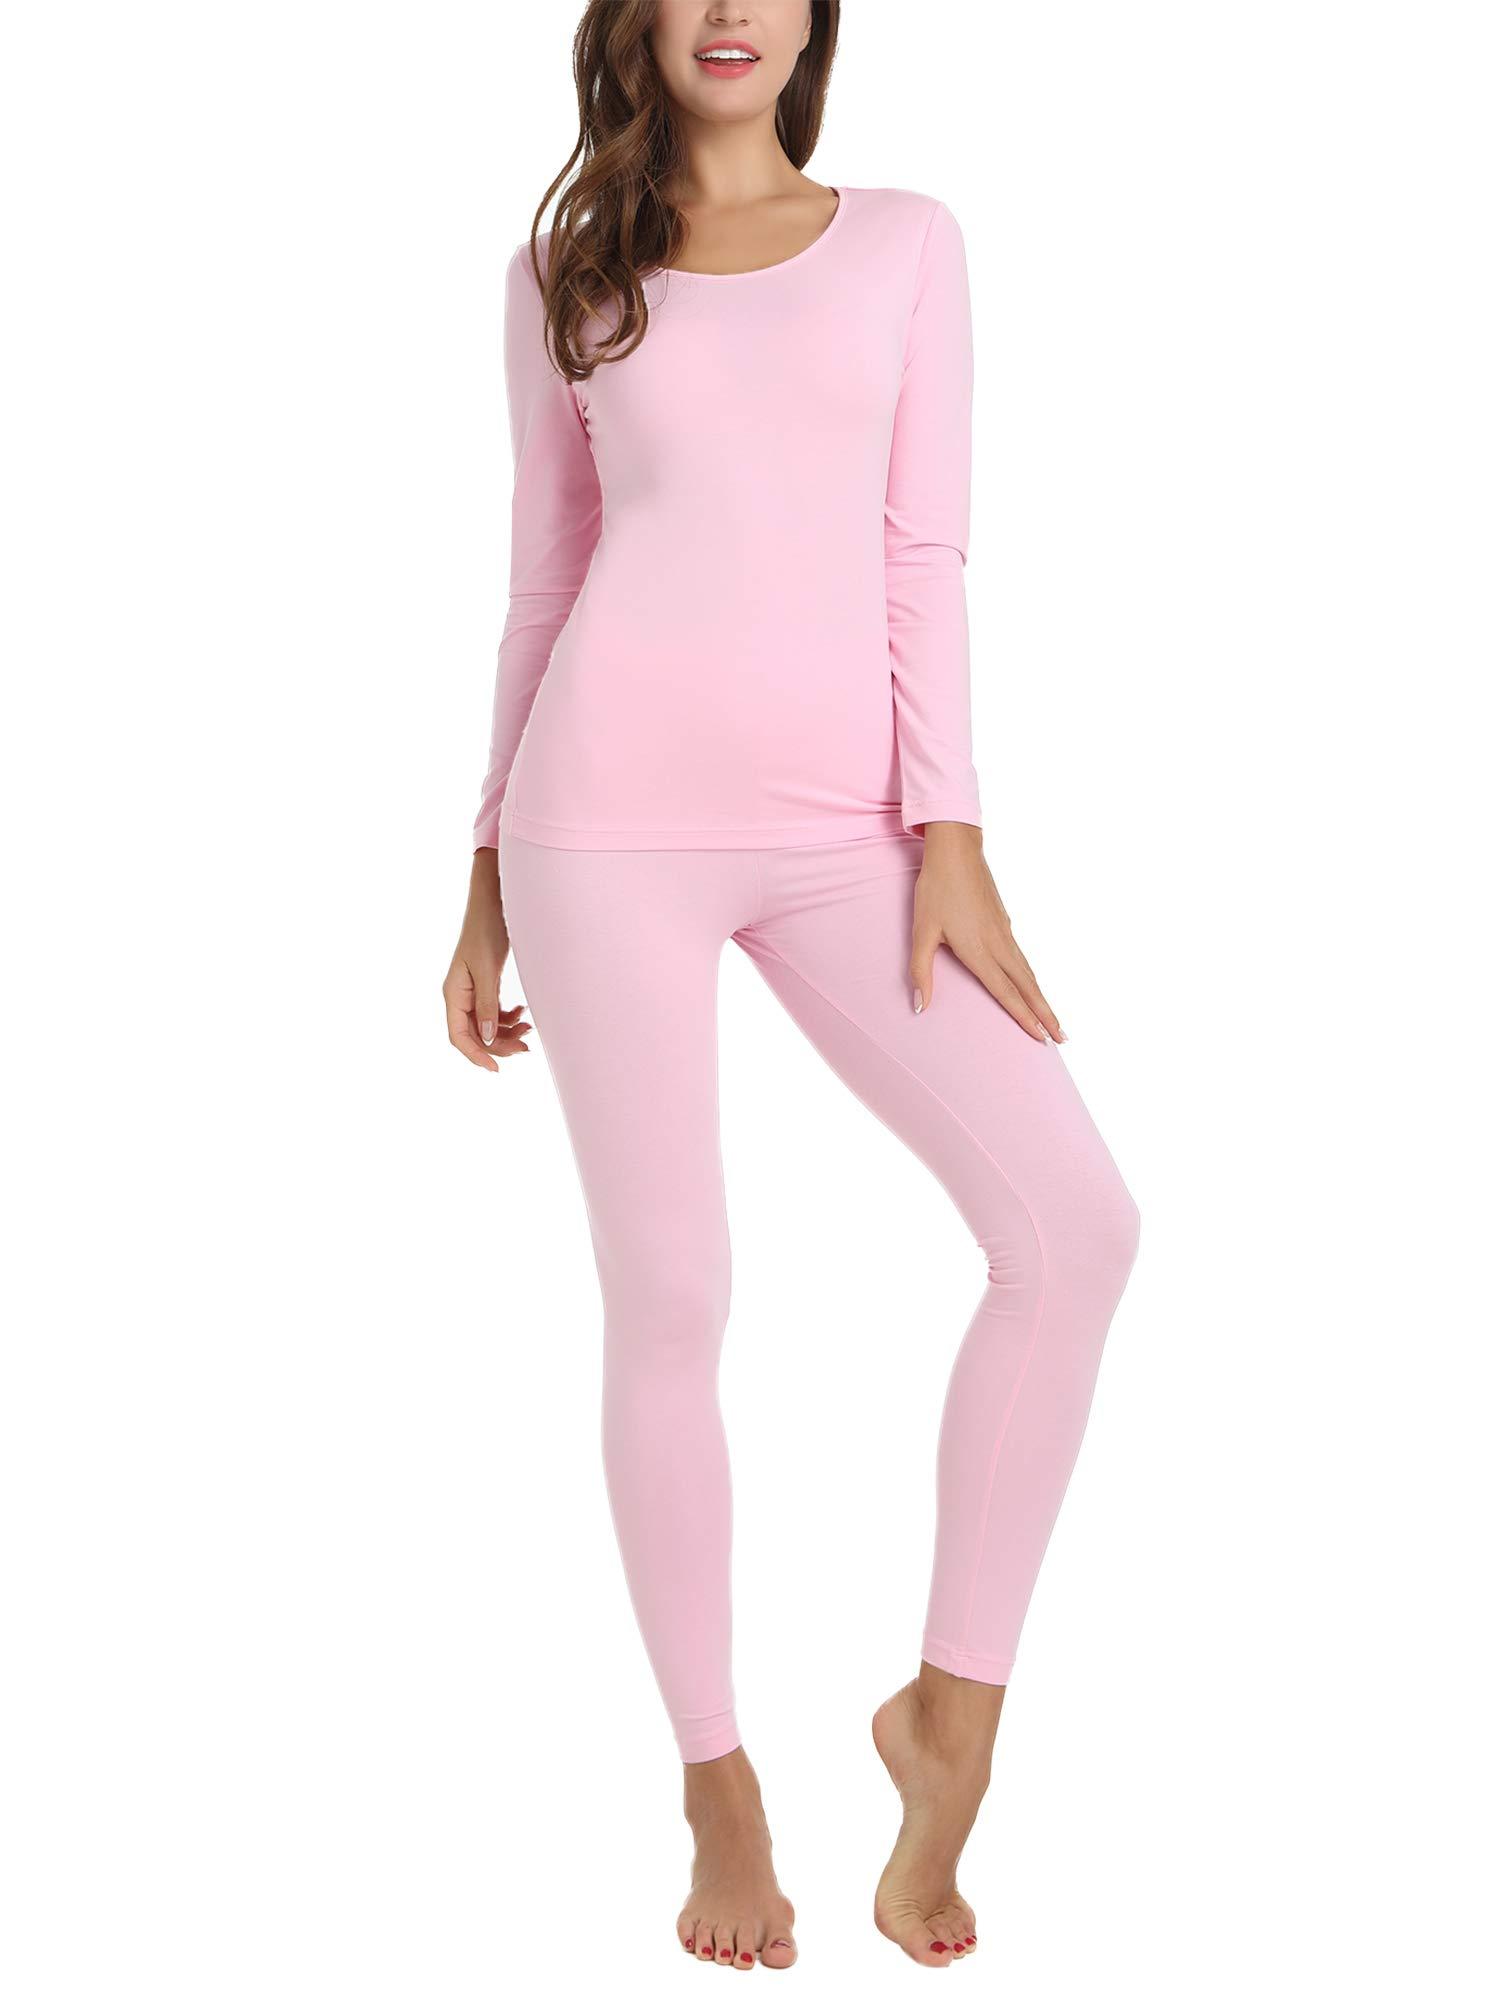 Amorbella Womens Thermal Pajama 2 Pc Long John Set Top and Bottom Underwear Ultra Soft Smooth Knit (Pink,XXL)